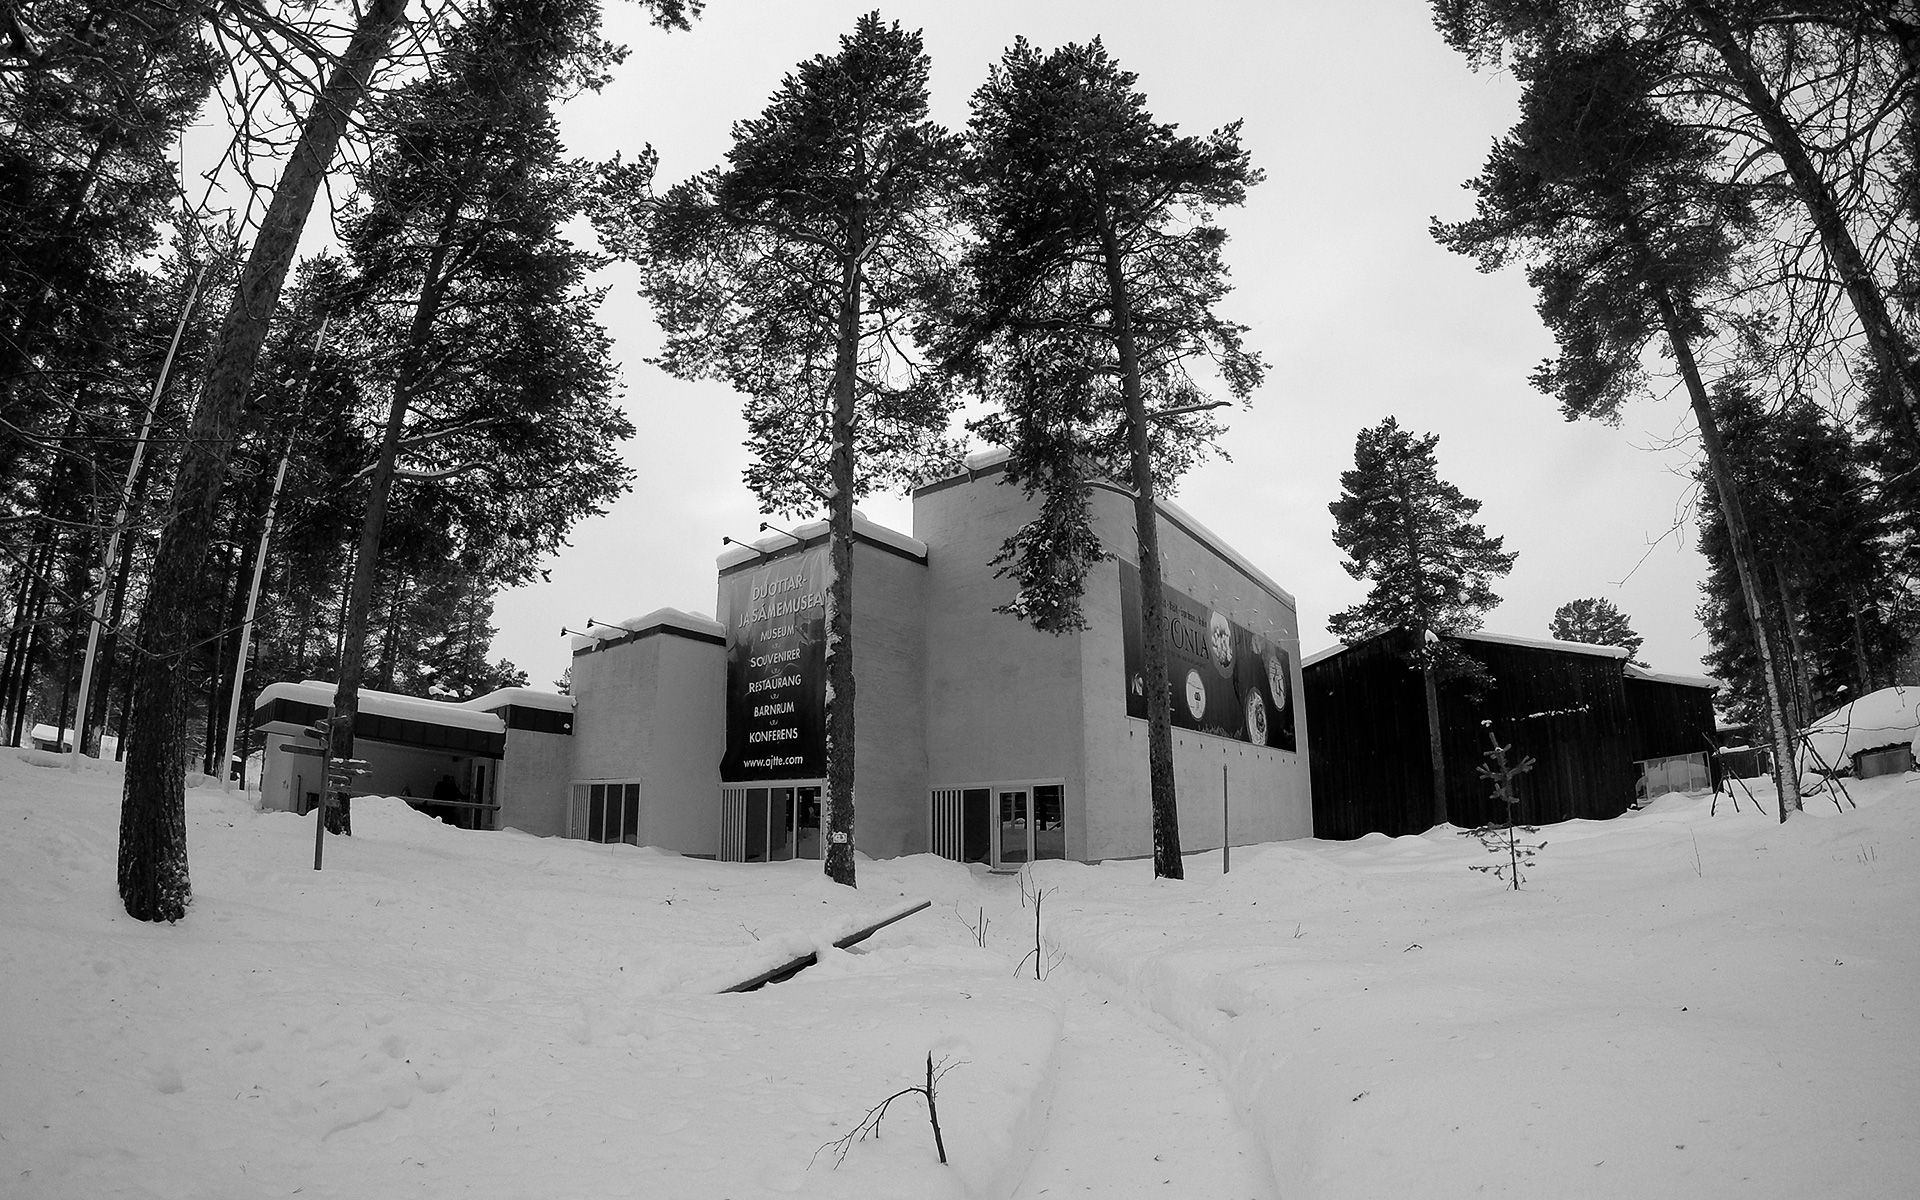 2016-02-04 - Ájtte Museum (black & white, wide angle lens)